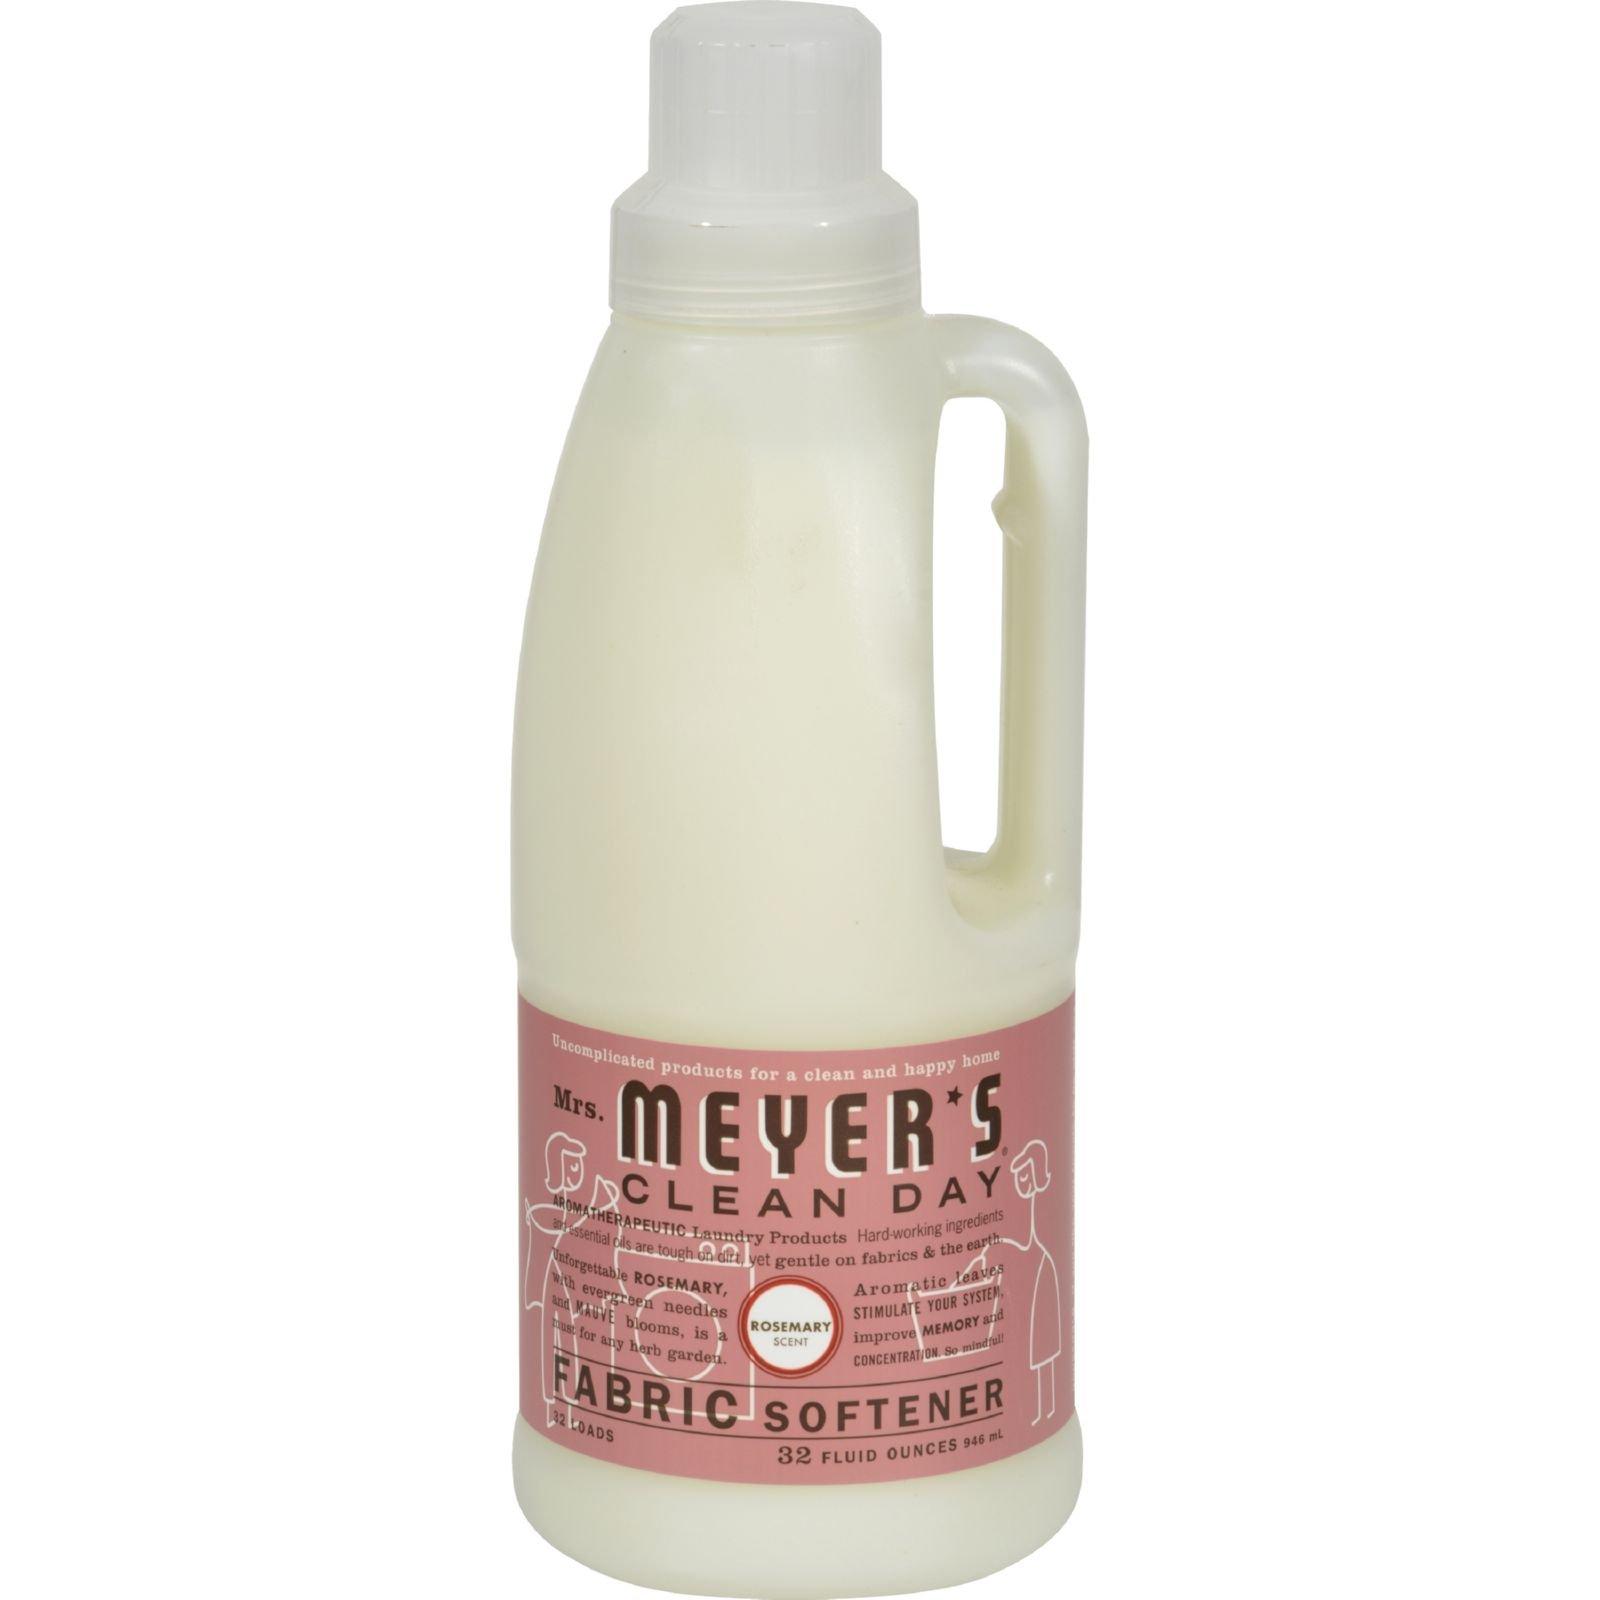 Mrs. Meyer's Fabric Softener - Rosemary - 32 oz